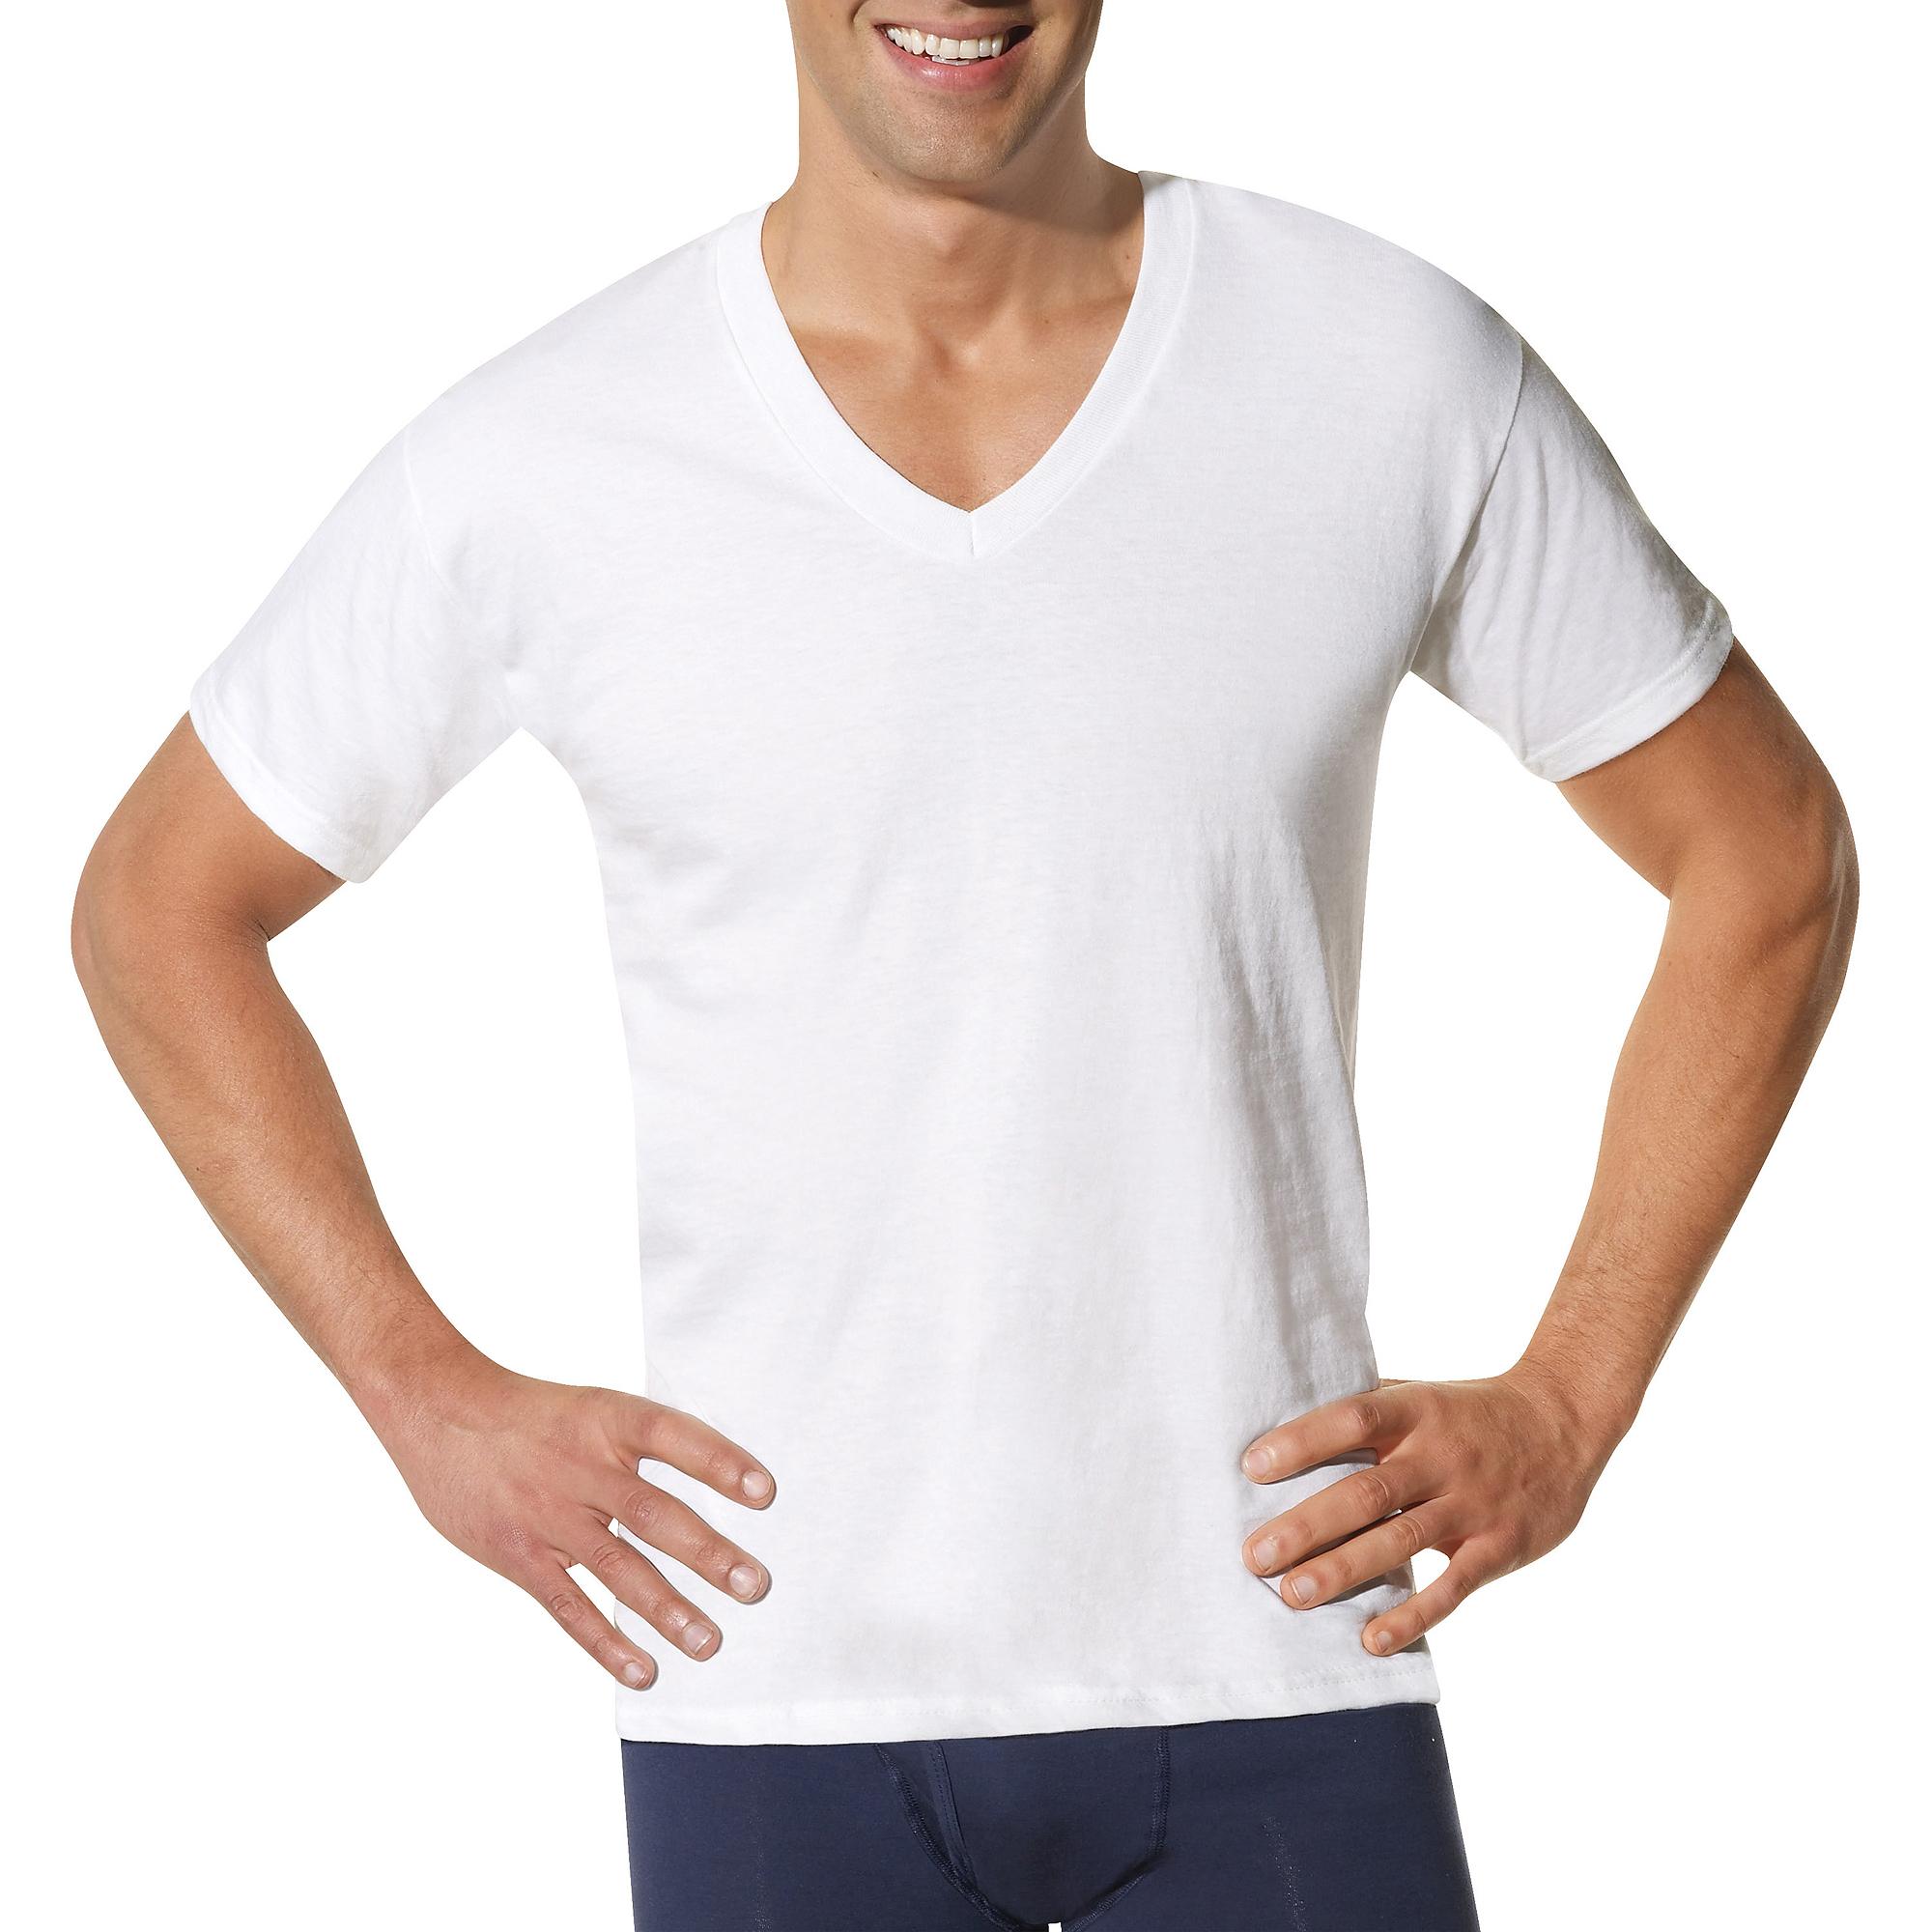 9-Pack Hanes Men's ComfortSoft Tagless V-Neck T-Shirts (White)  $12.90 + Free Shipping